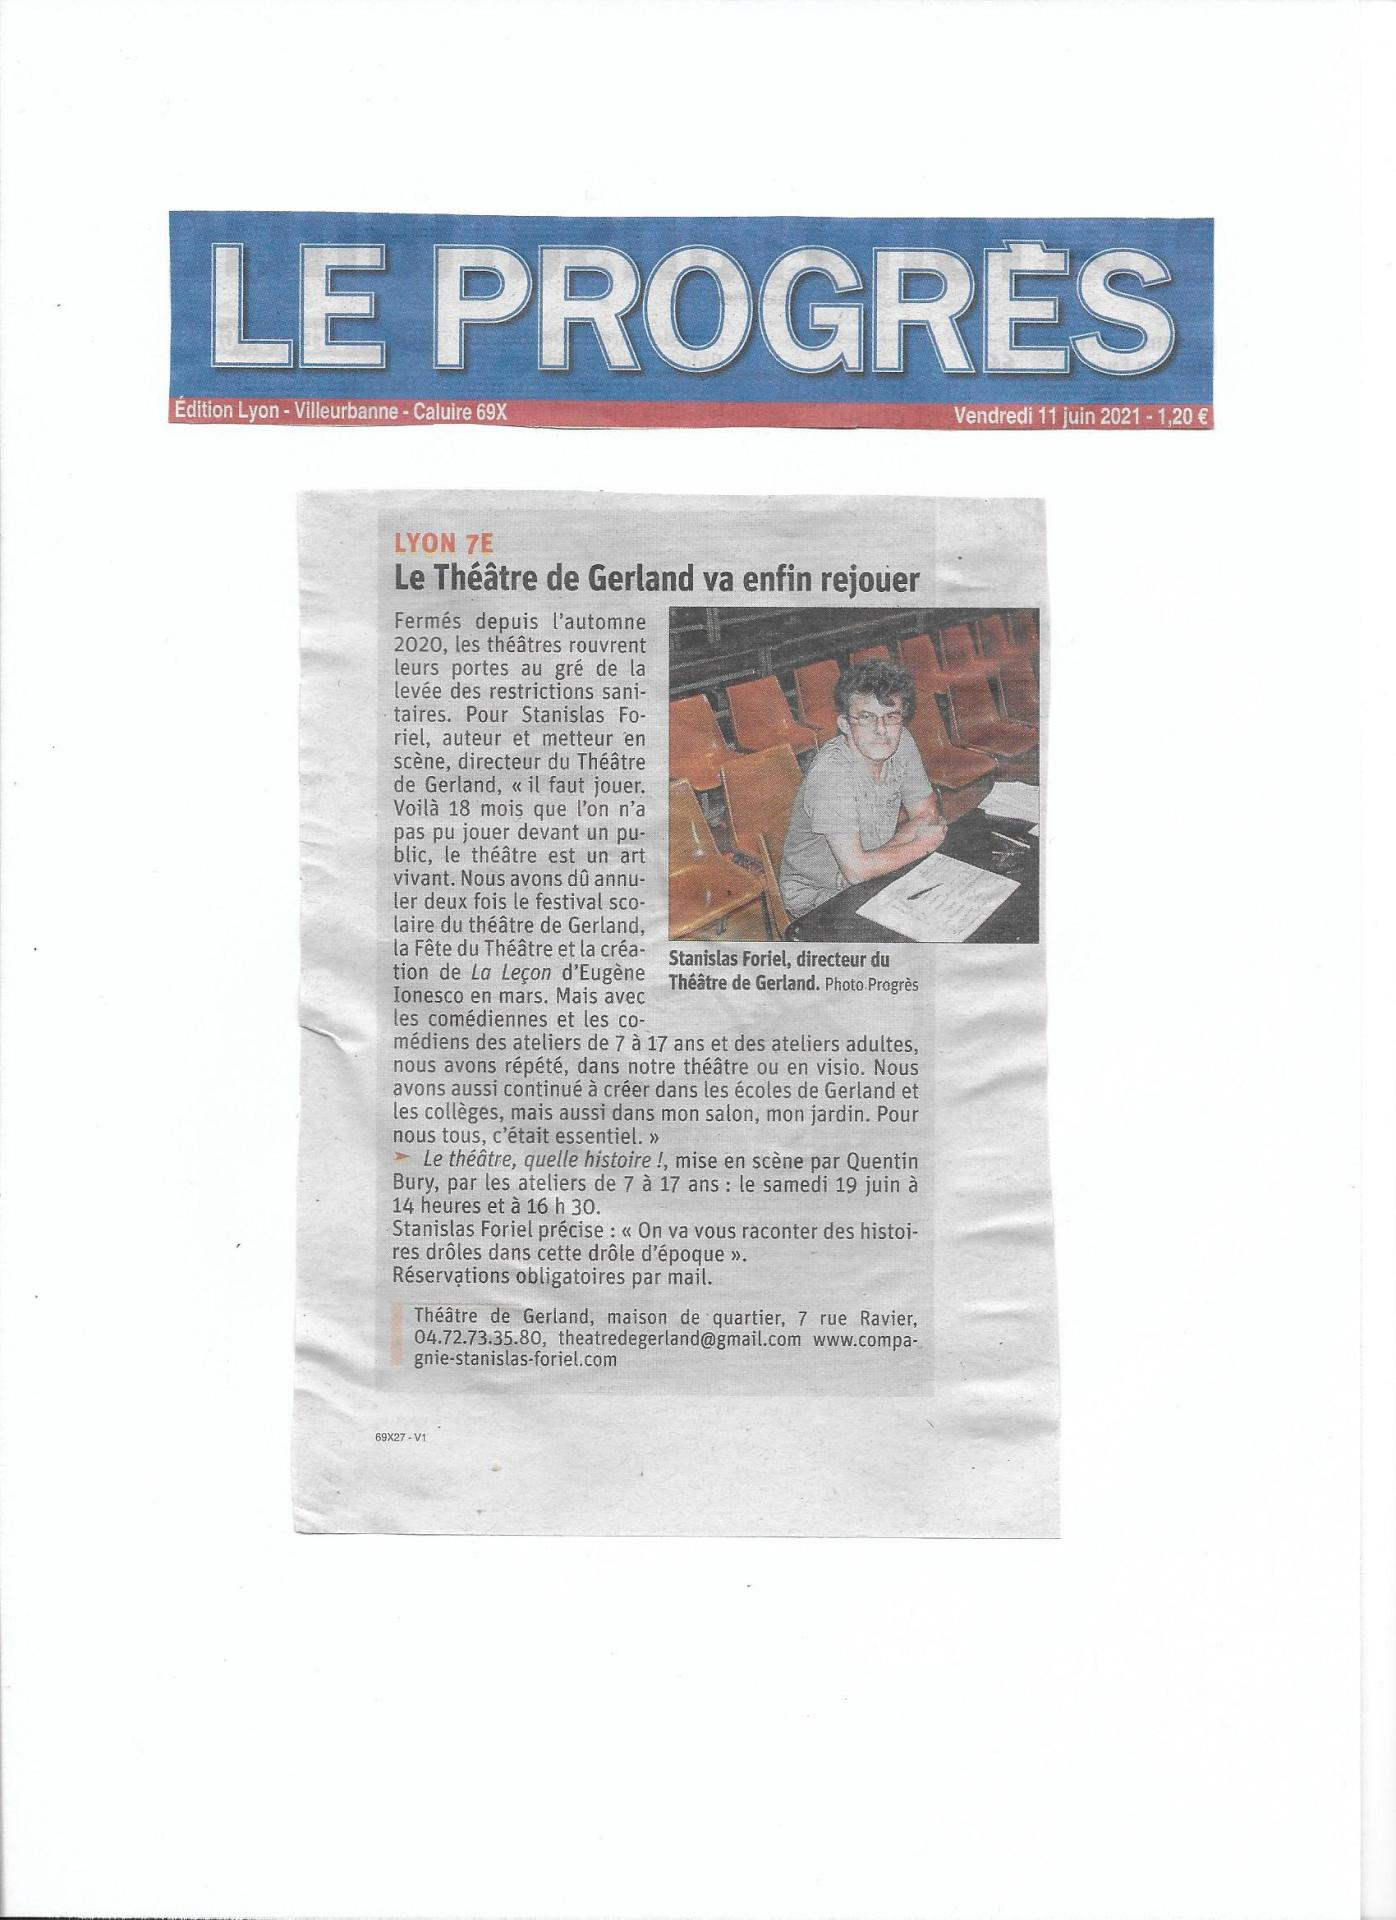 Article progres le theatre de gerland 11 06 2021